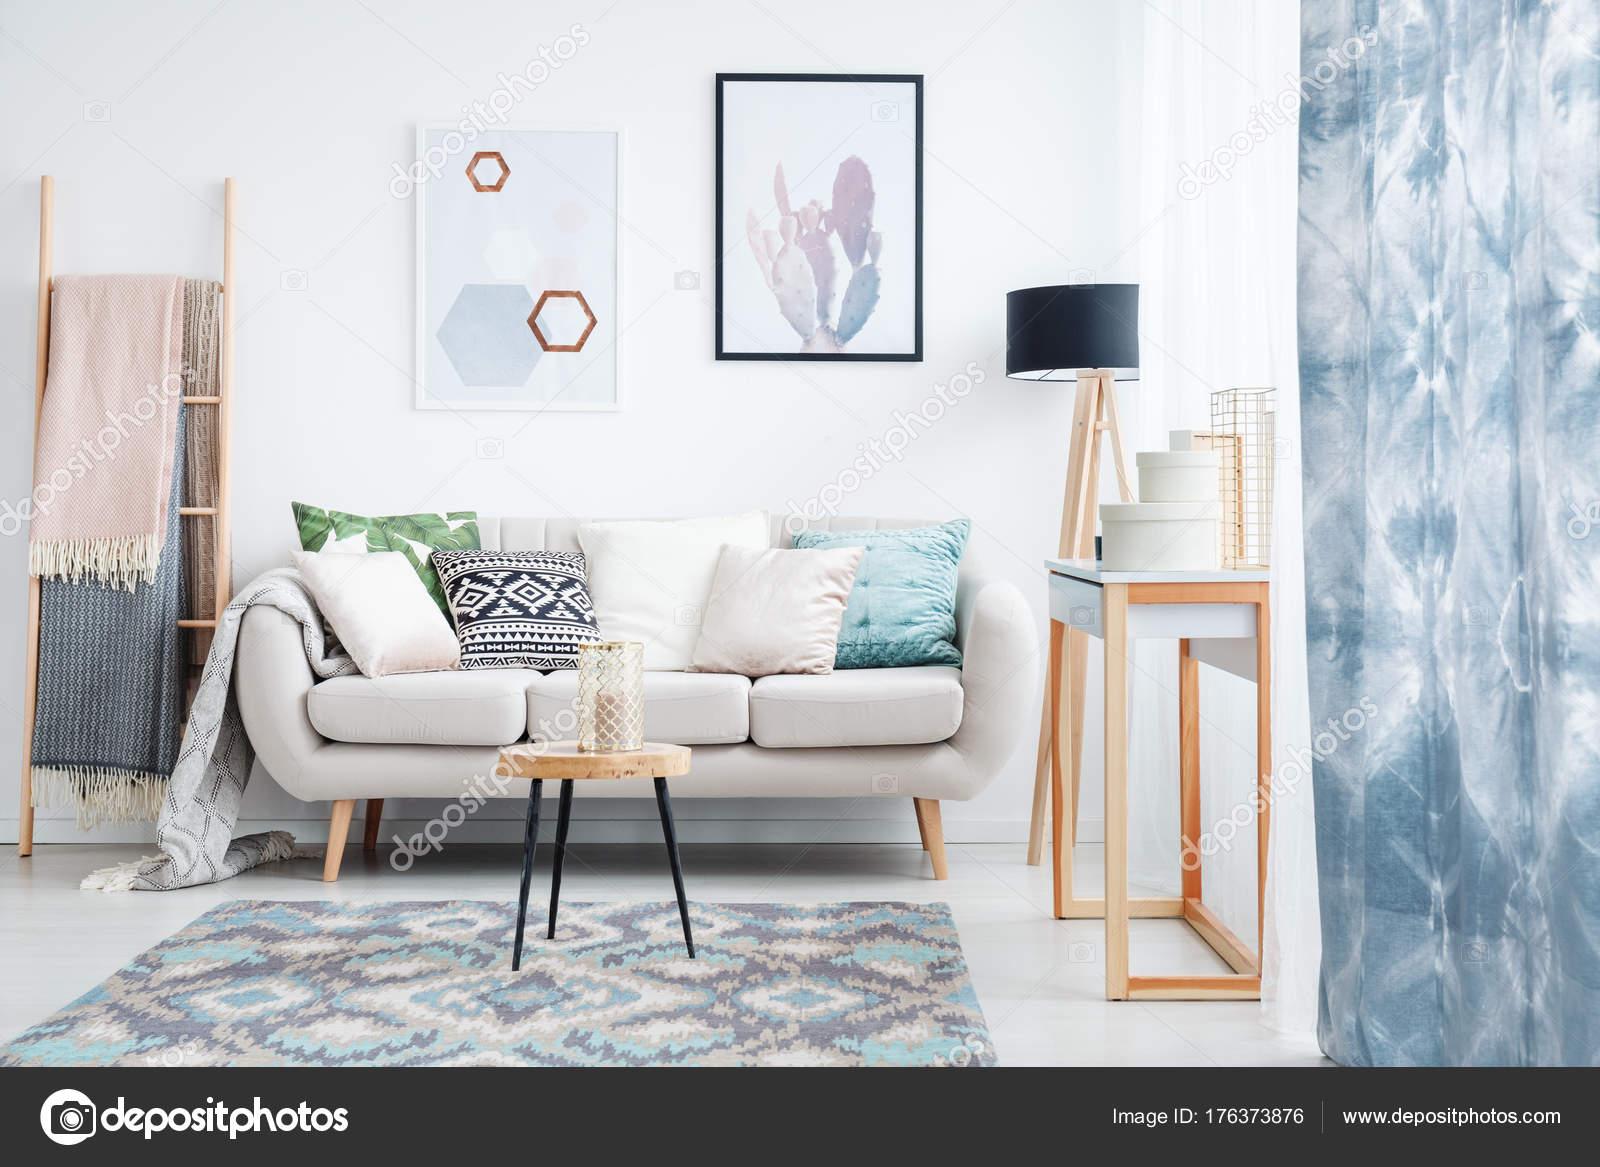 Blauwe gordijn in woonkamer — Stockfoto © photographee.eu #176373876